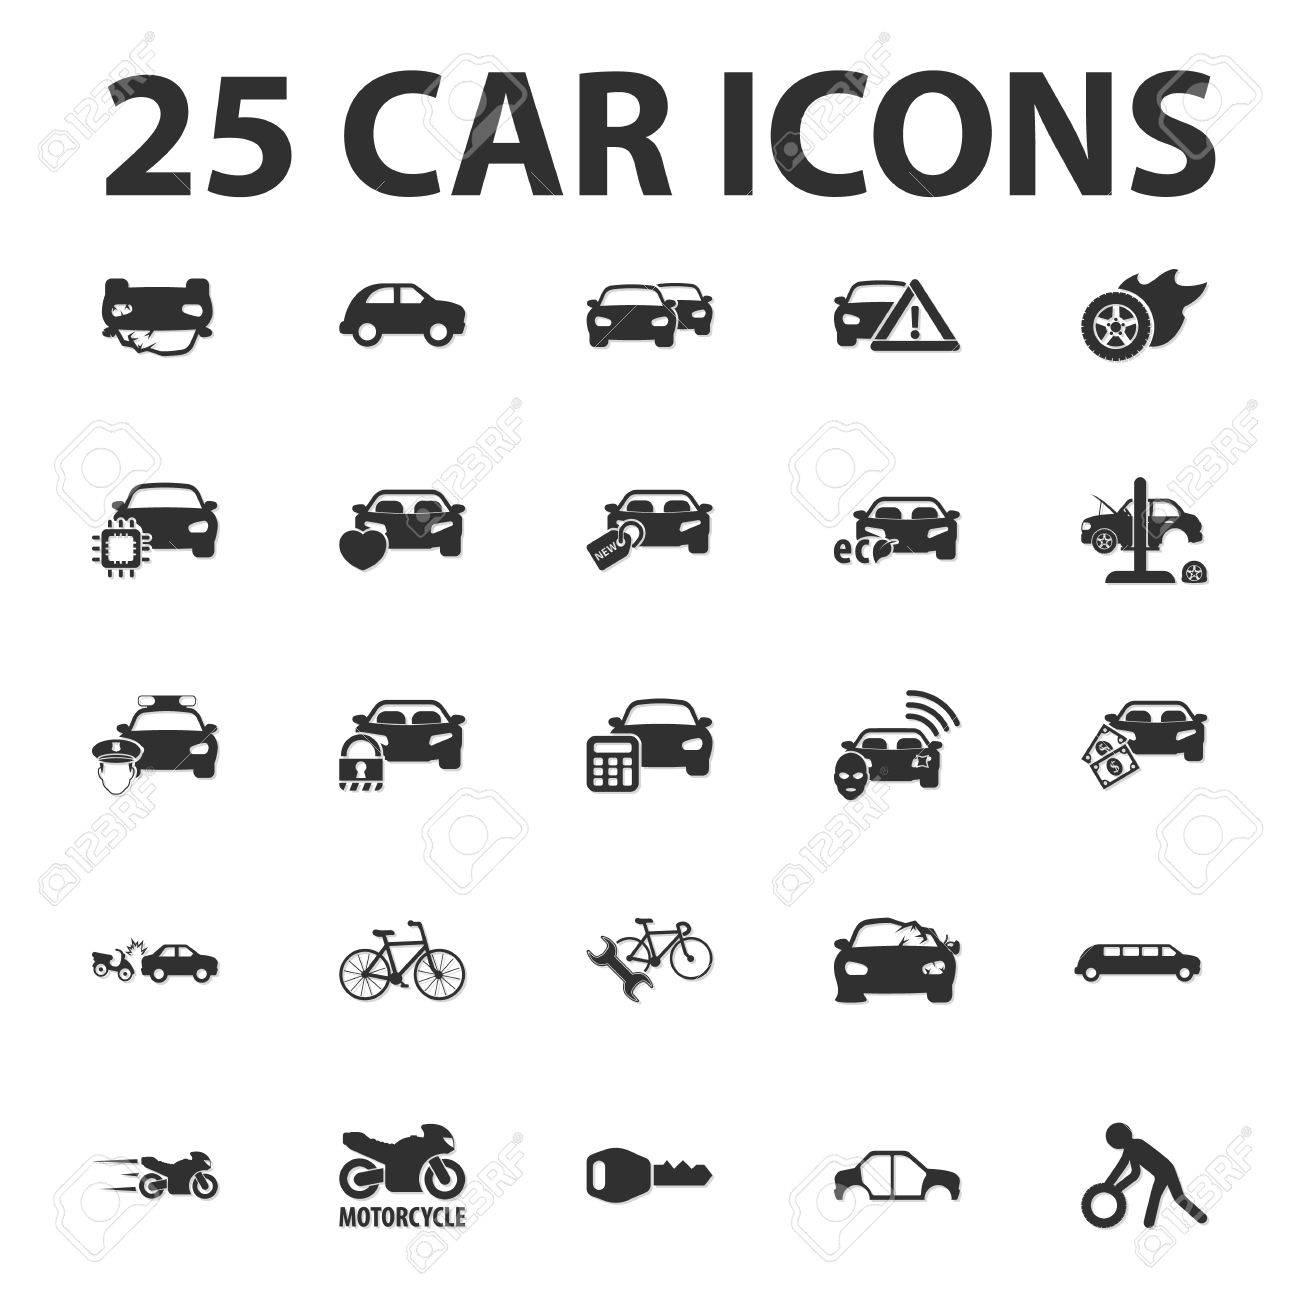 Car, repair 25 black simple icons set for web design - 51028089